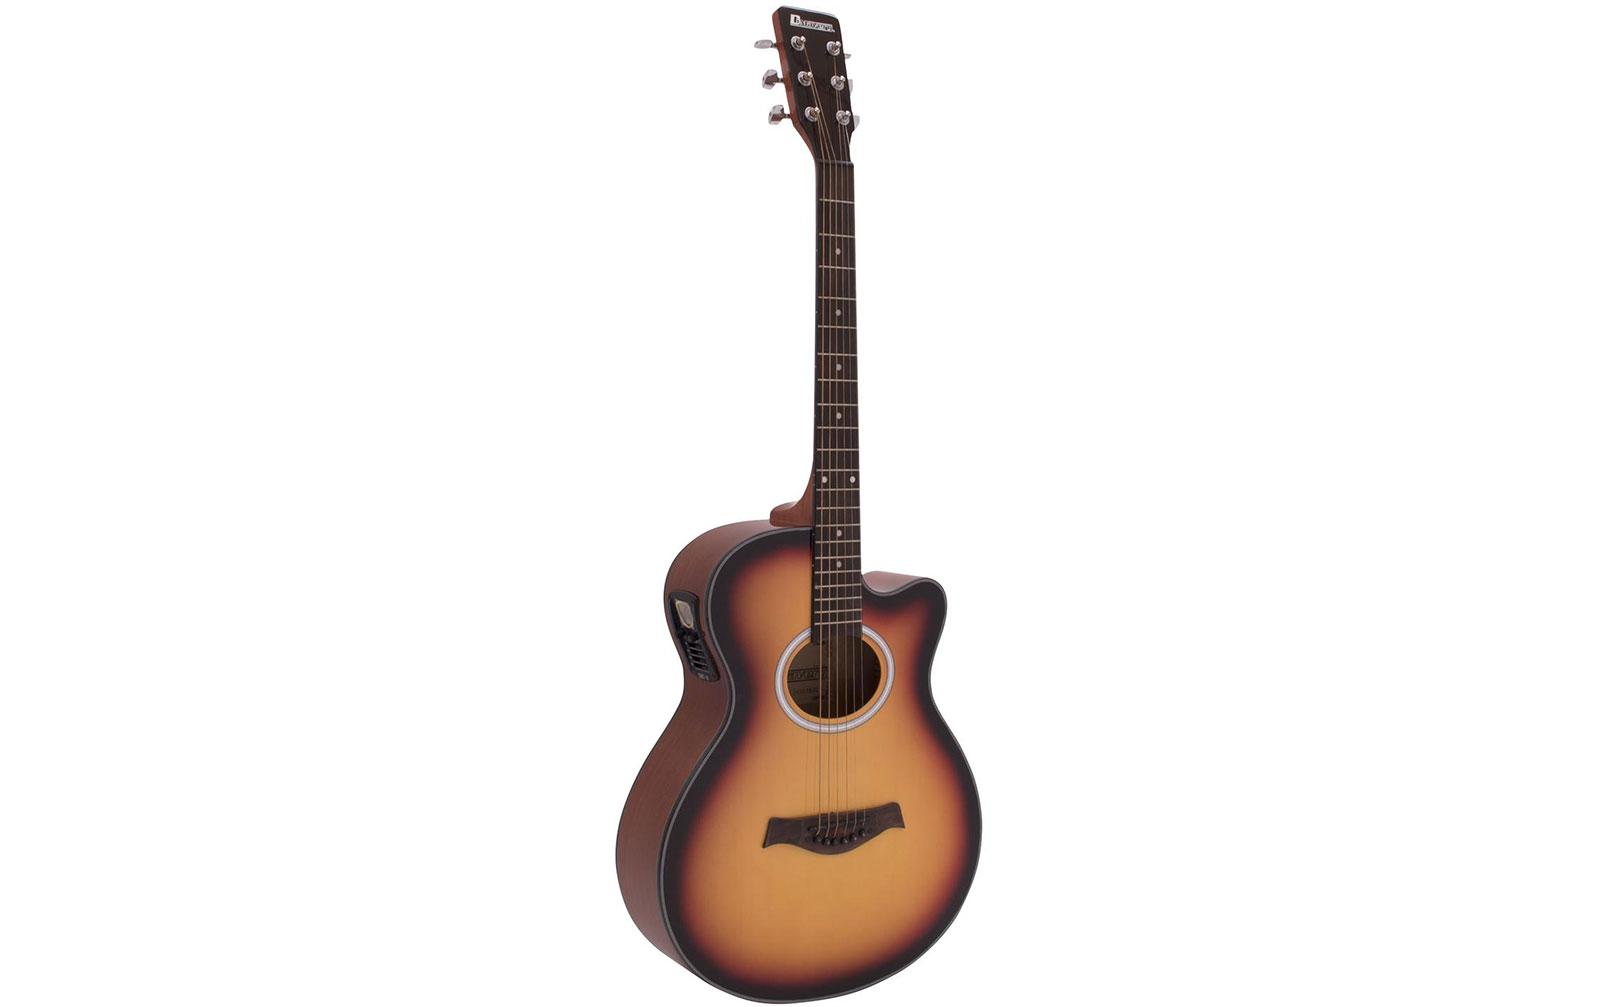 dimavery-aw-400-western-gitarre-sunburst